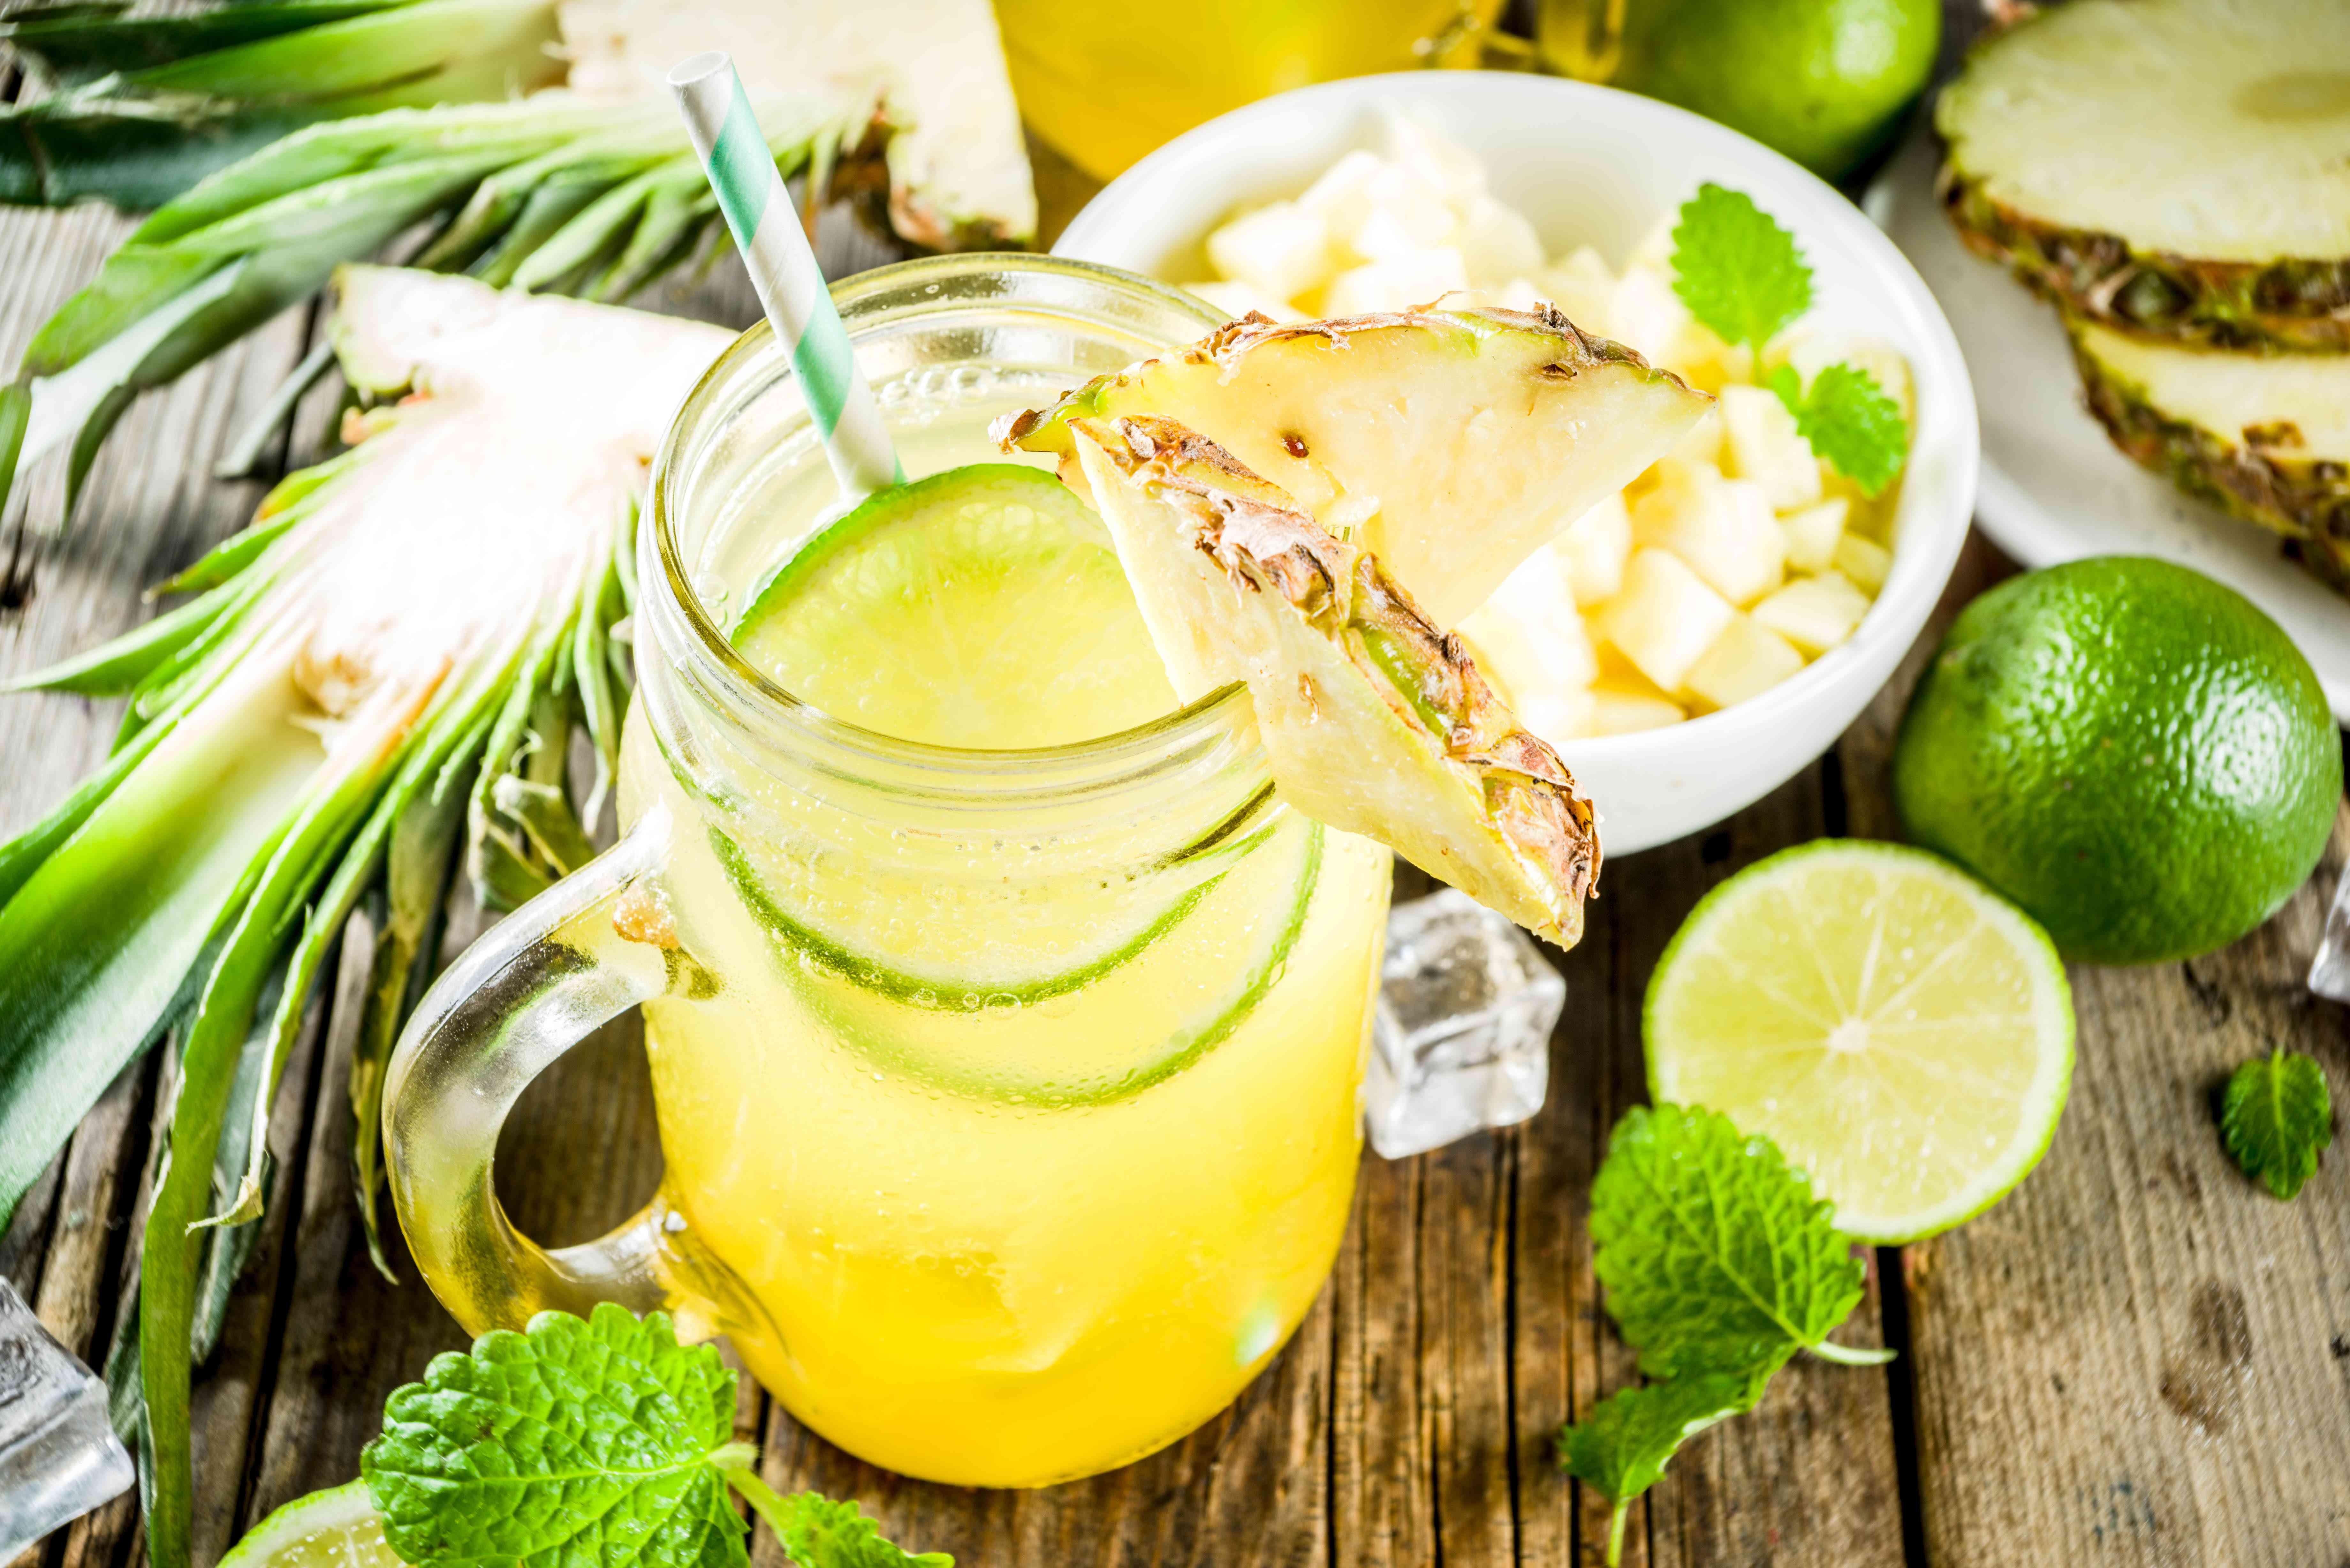 Cold pineapple mojito cocktail